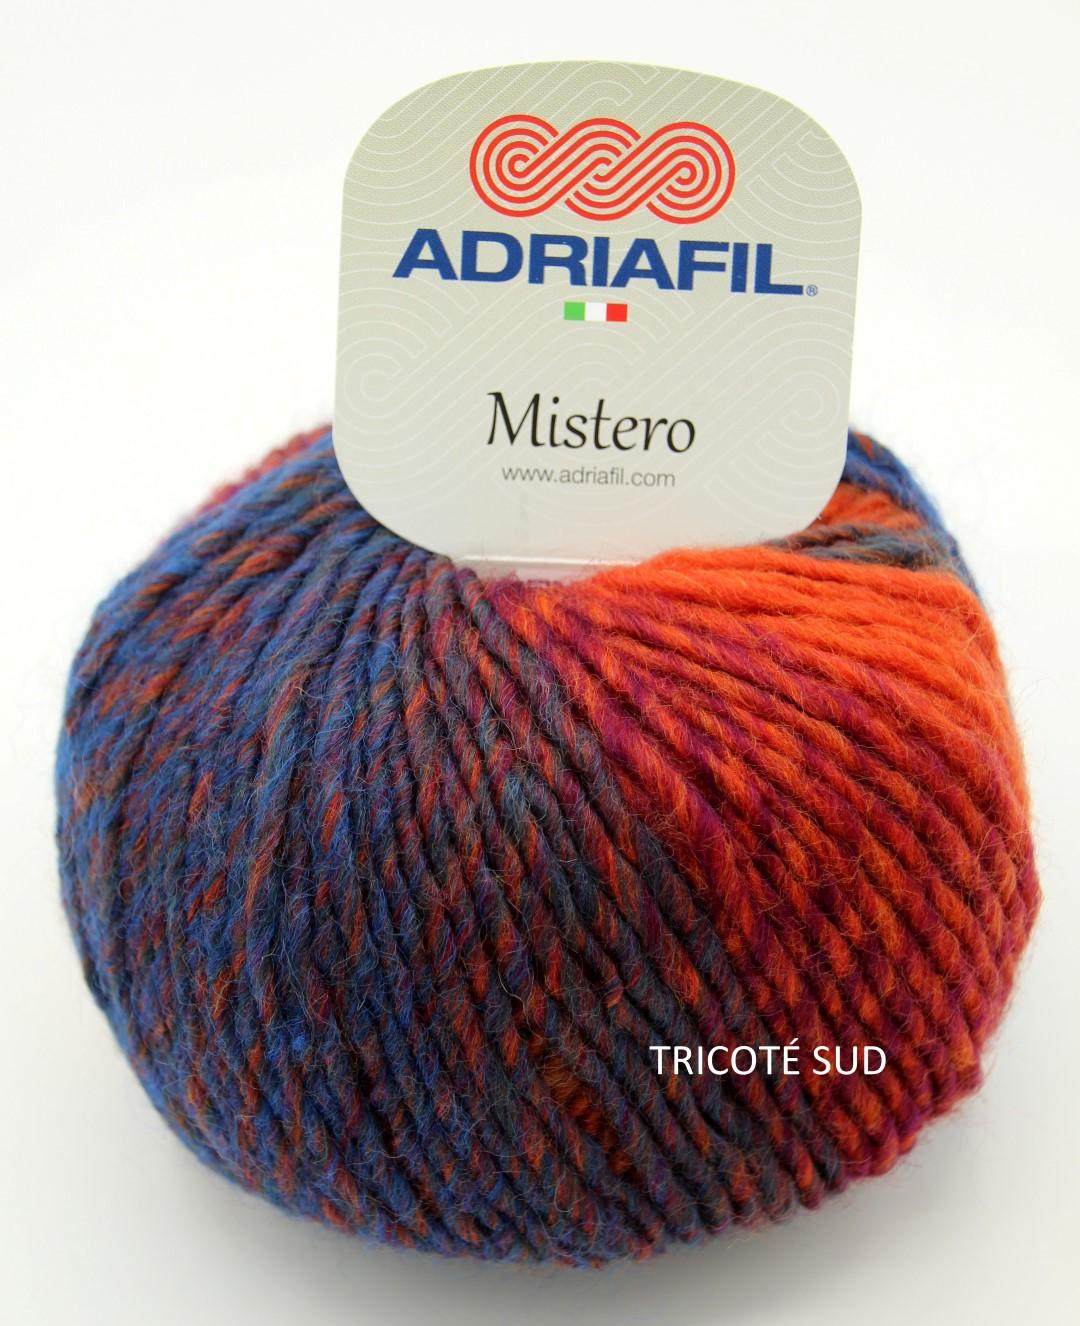 MISTERO ADRIAFIL COLORIS 71 (1) (Large)